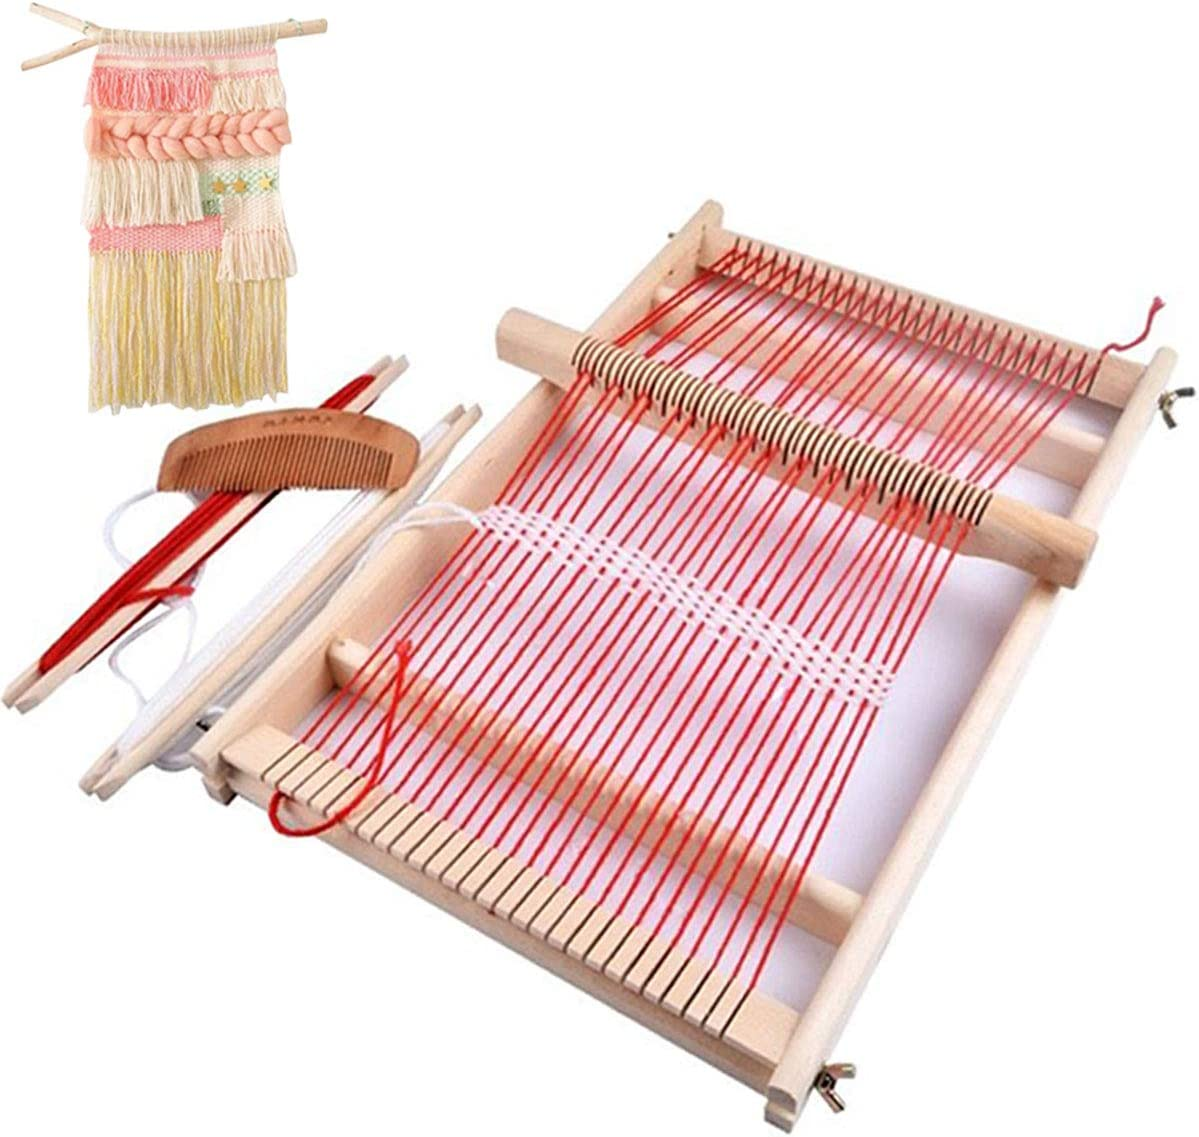 Mikimiqi Wooden Multi-Craft Finally popular brand Weaving Loom Large 15.75 shipfree 9.85x Frame